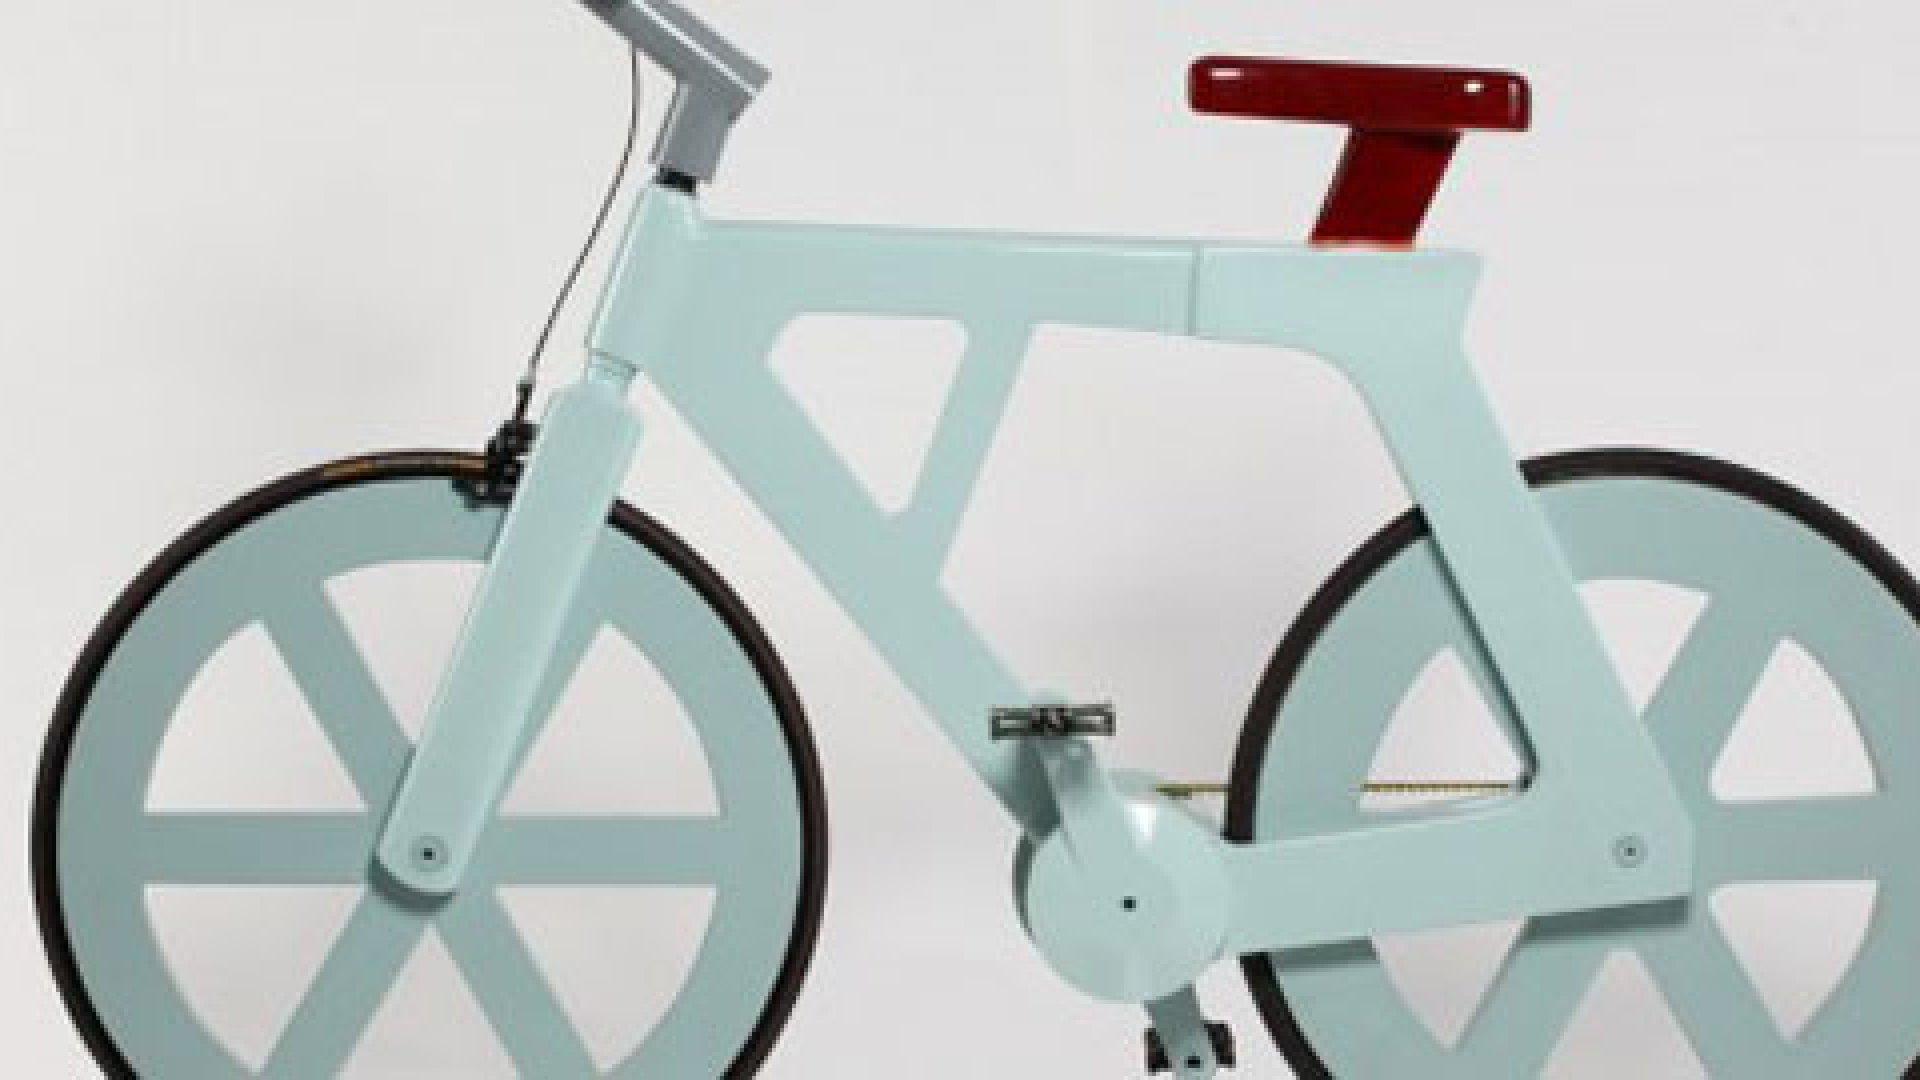 Cool Aha Moment: The Cardboard Bicycle